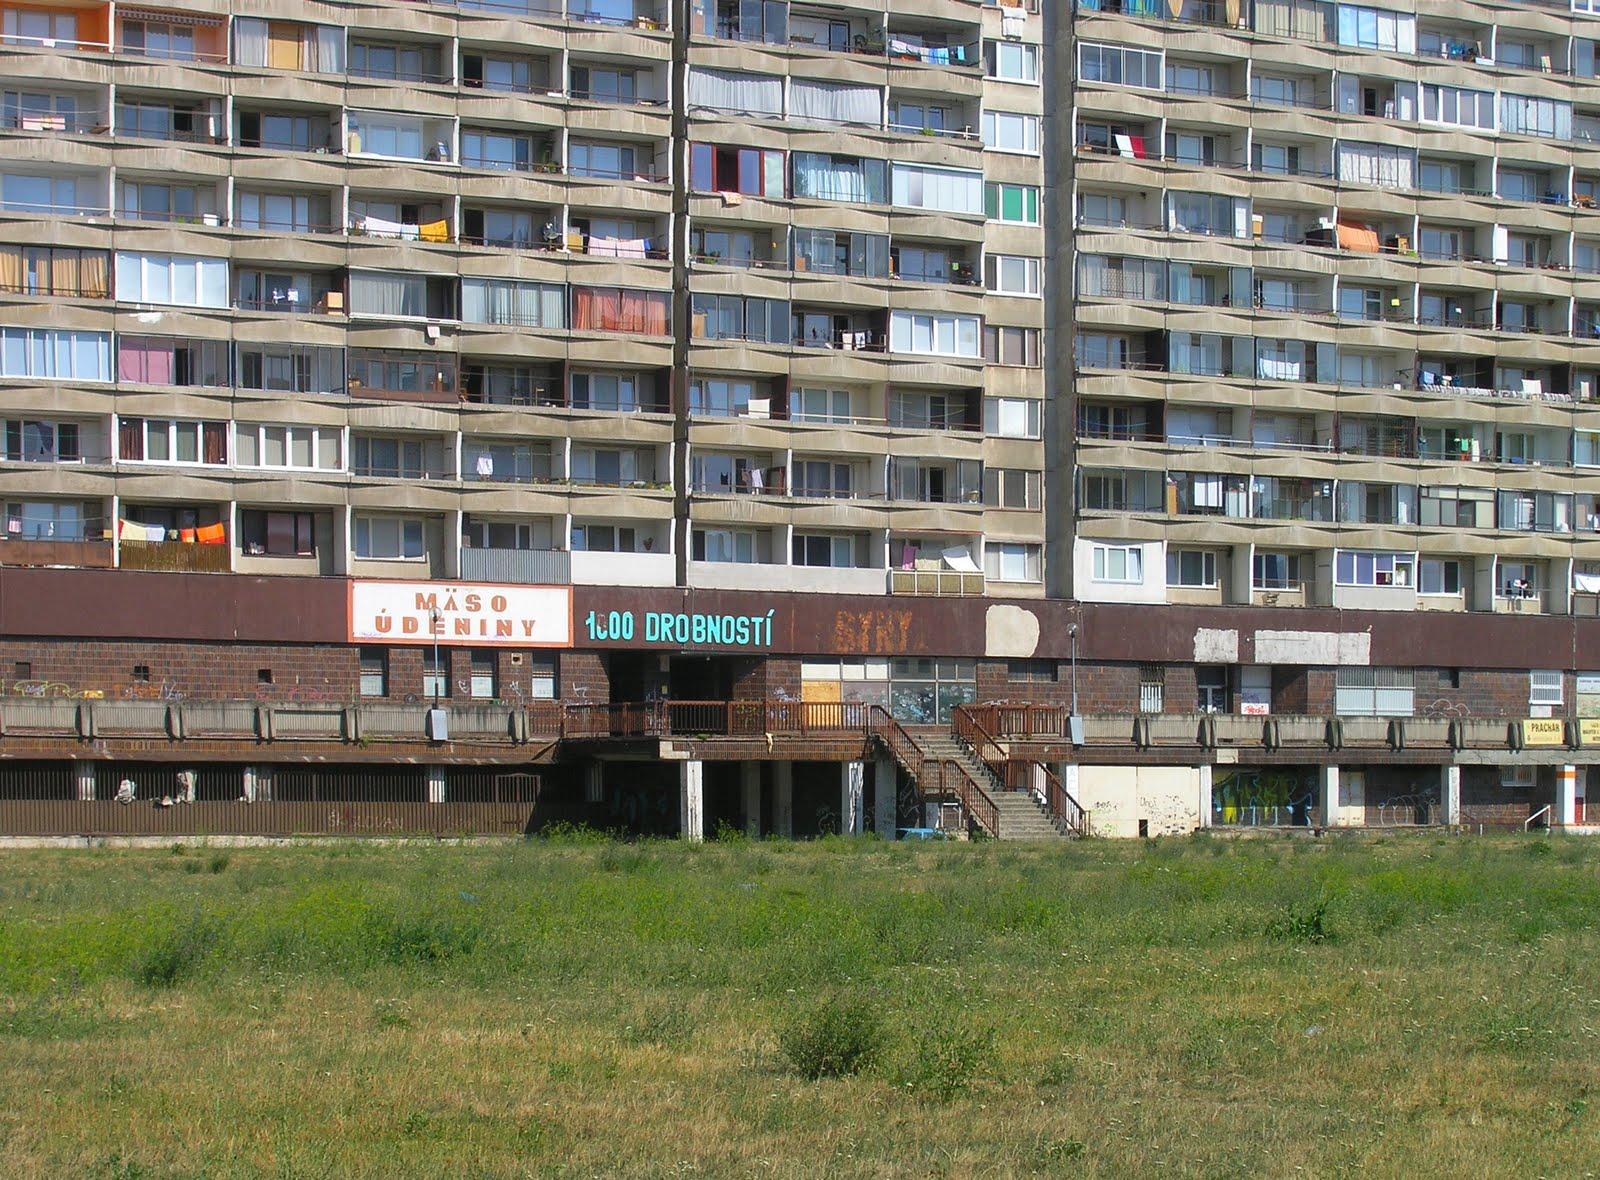 Efl teaching in bratislava experiences bratislava a for Bratislava apartments